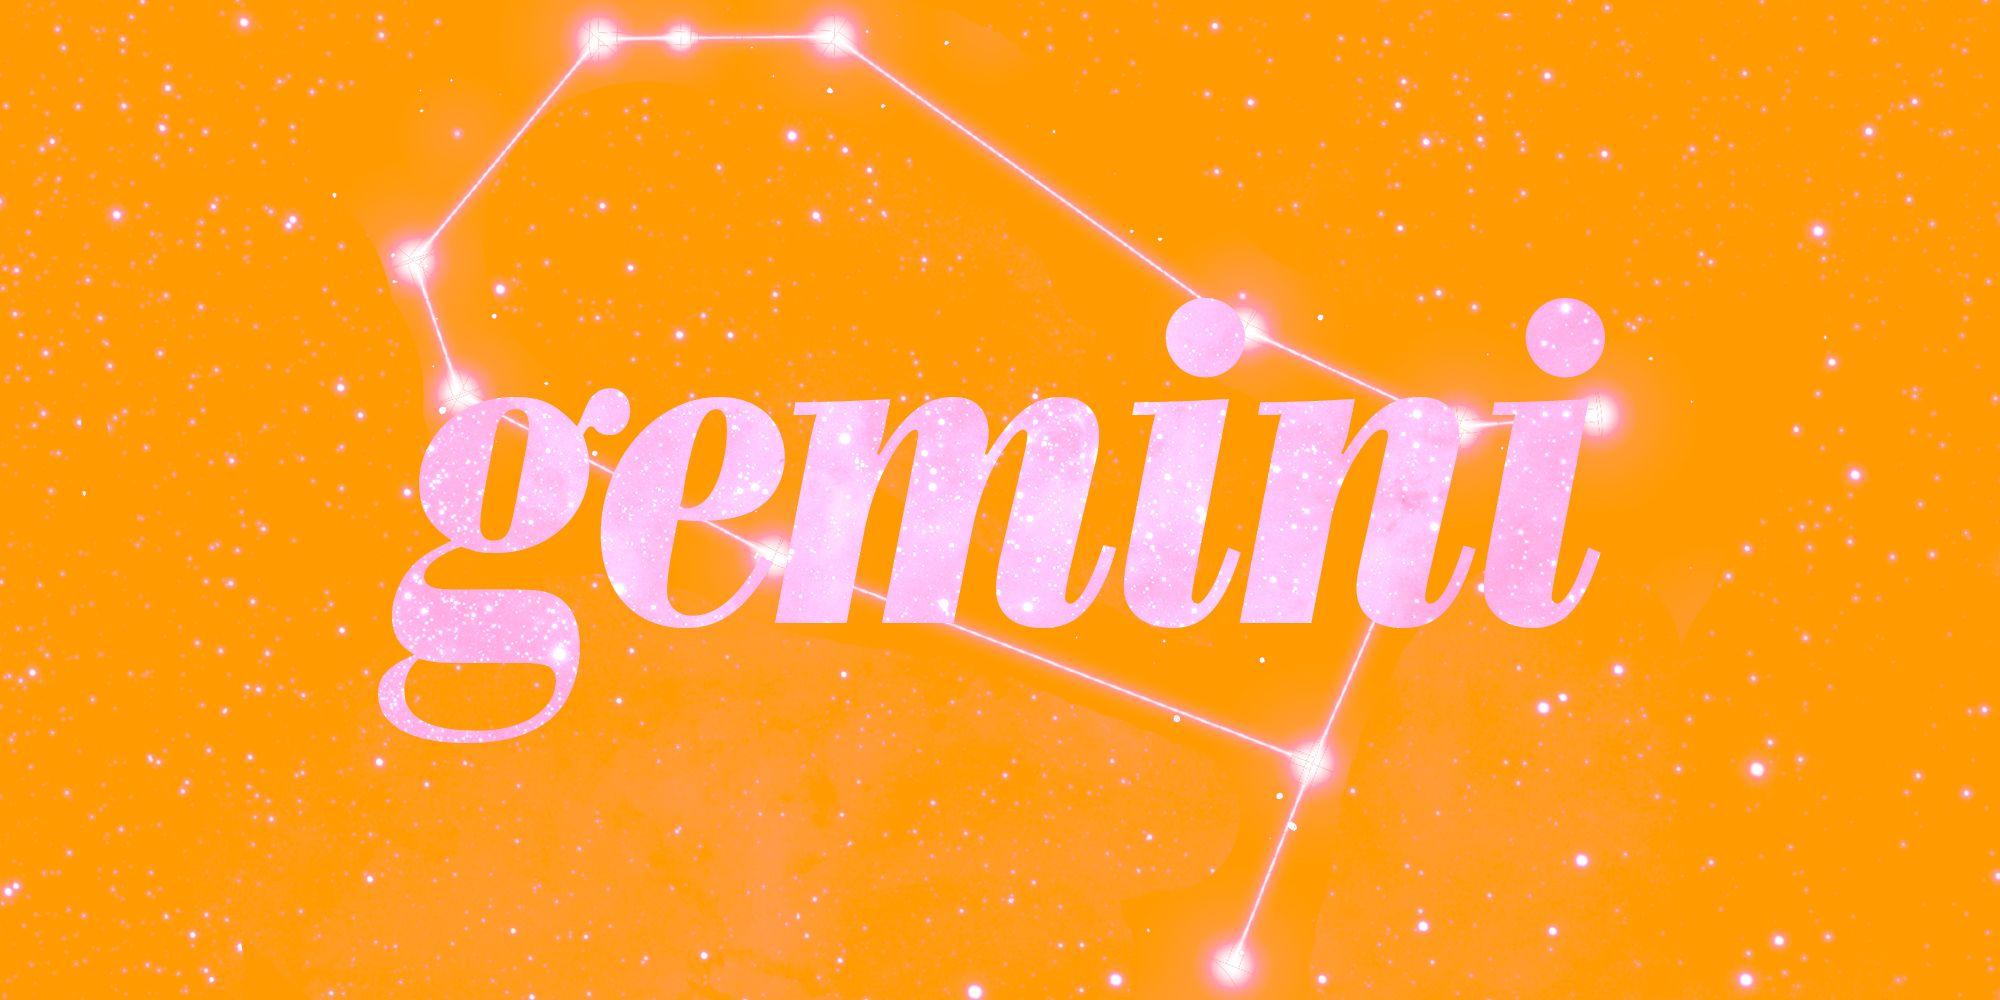 cosmopolitan horoscope february 18